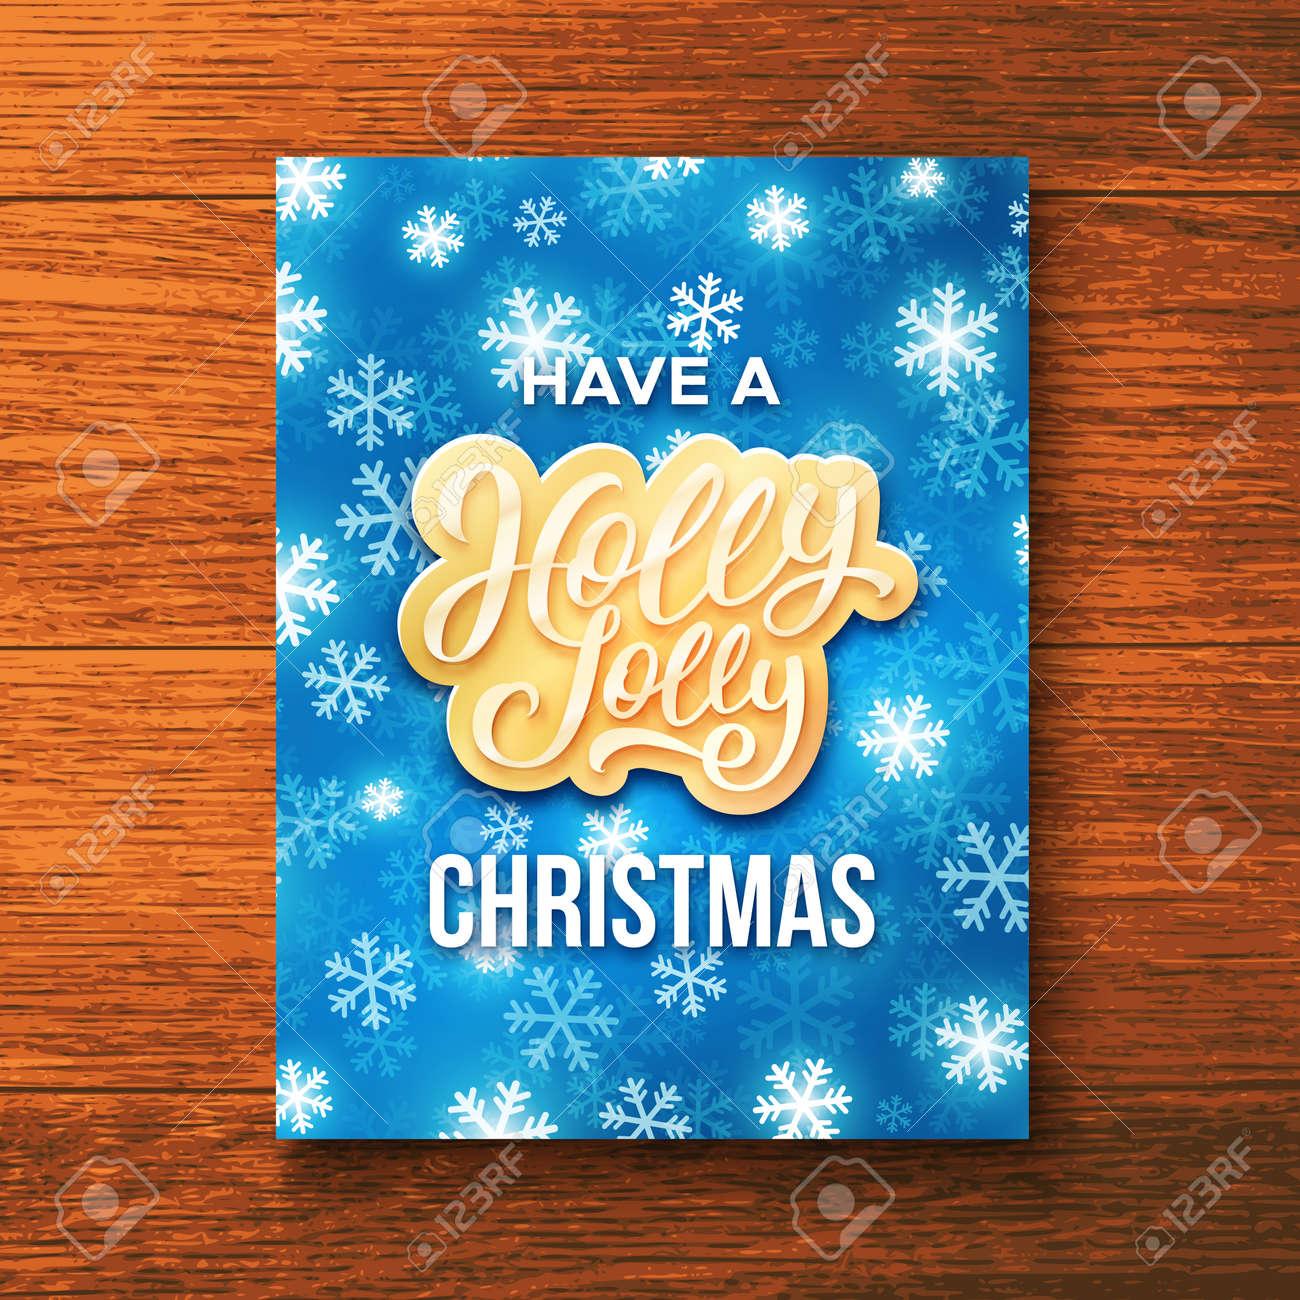 Have A Holly Jolly Christmas Season Greetings On Festive Blue